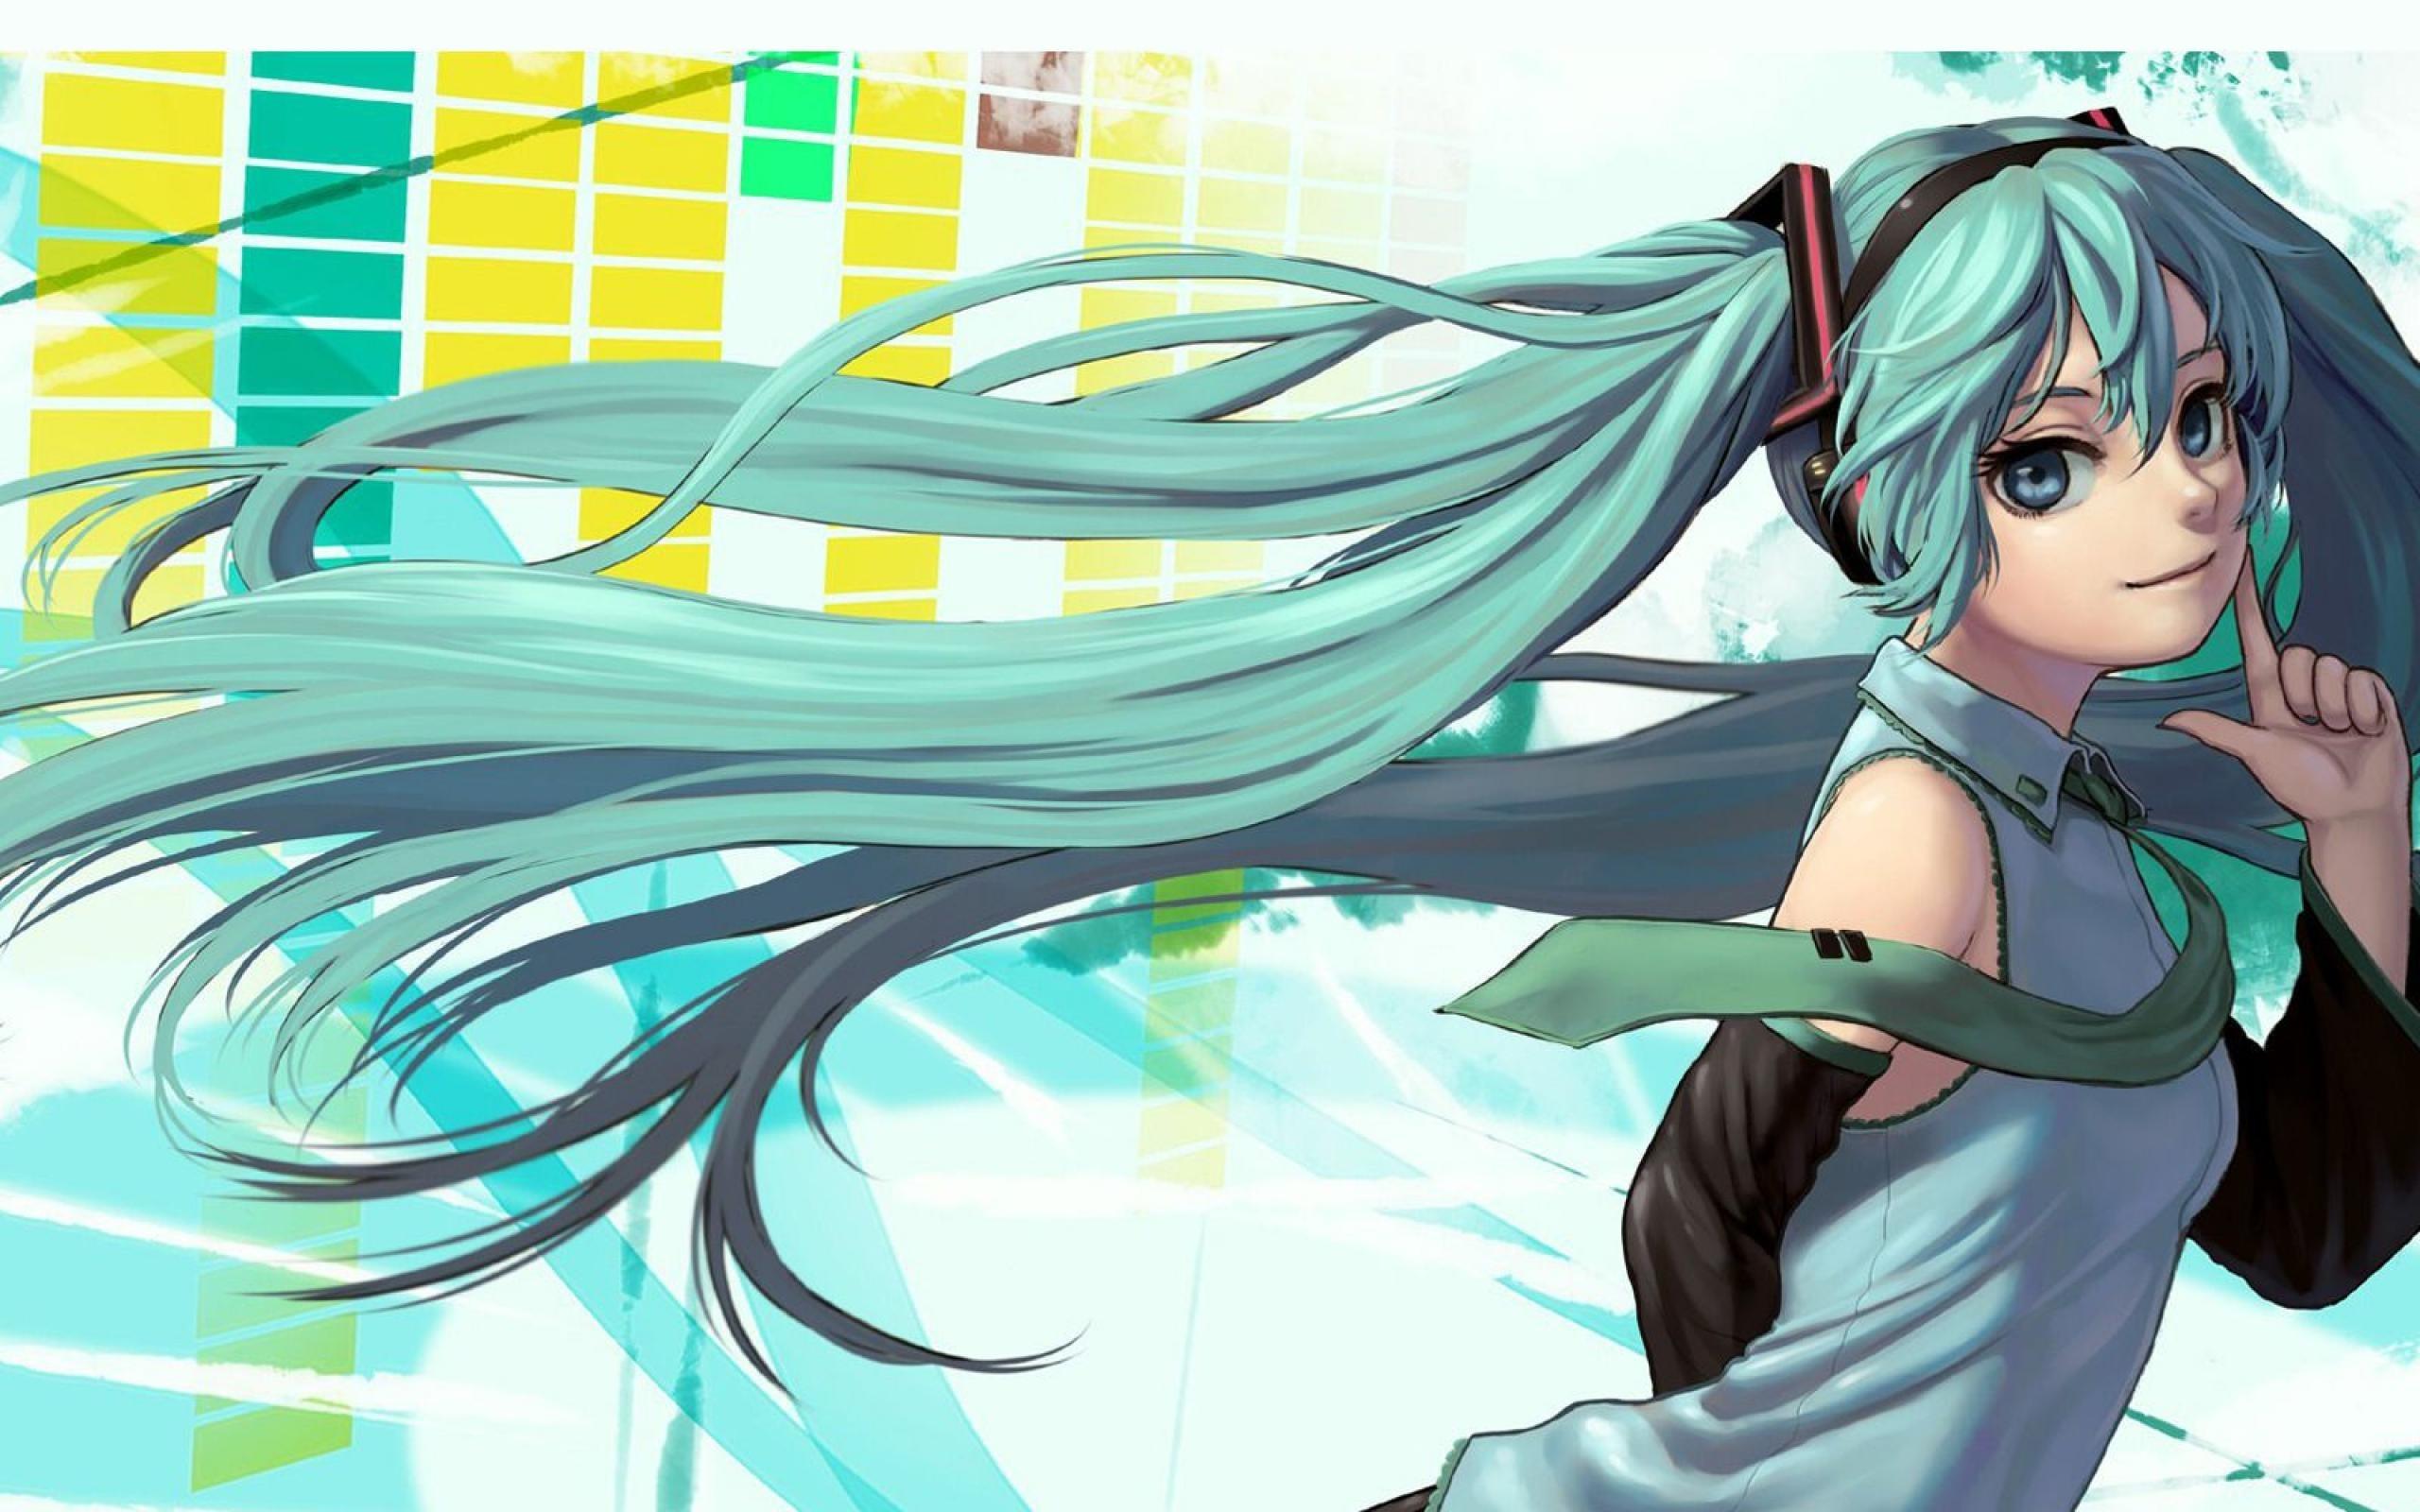 Hatsune Miku Anime Design Hd Wallpaper 2560x1600 Download